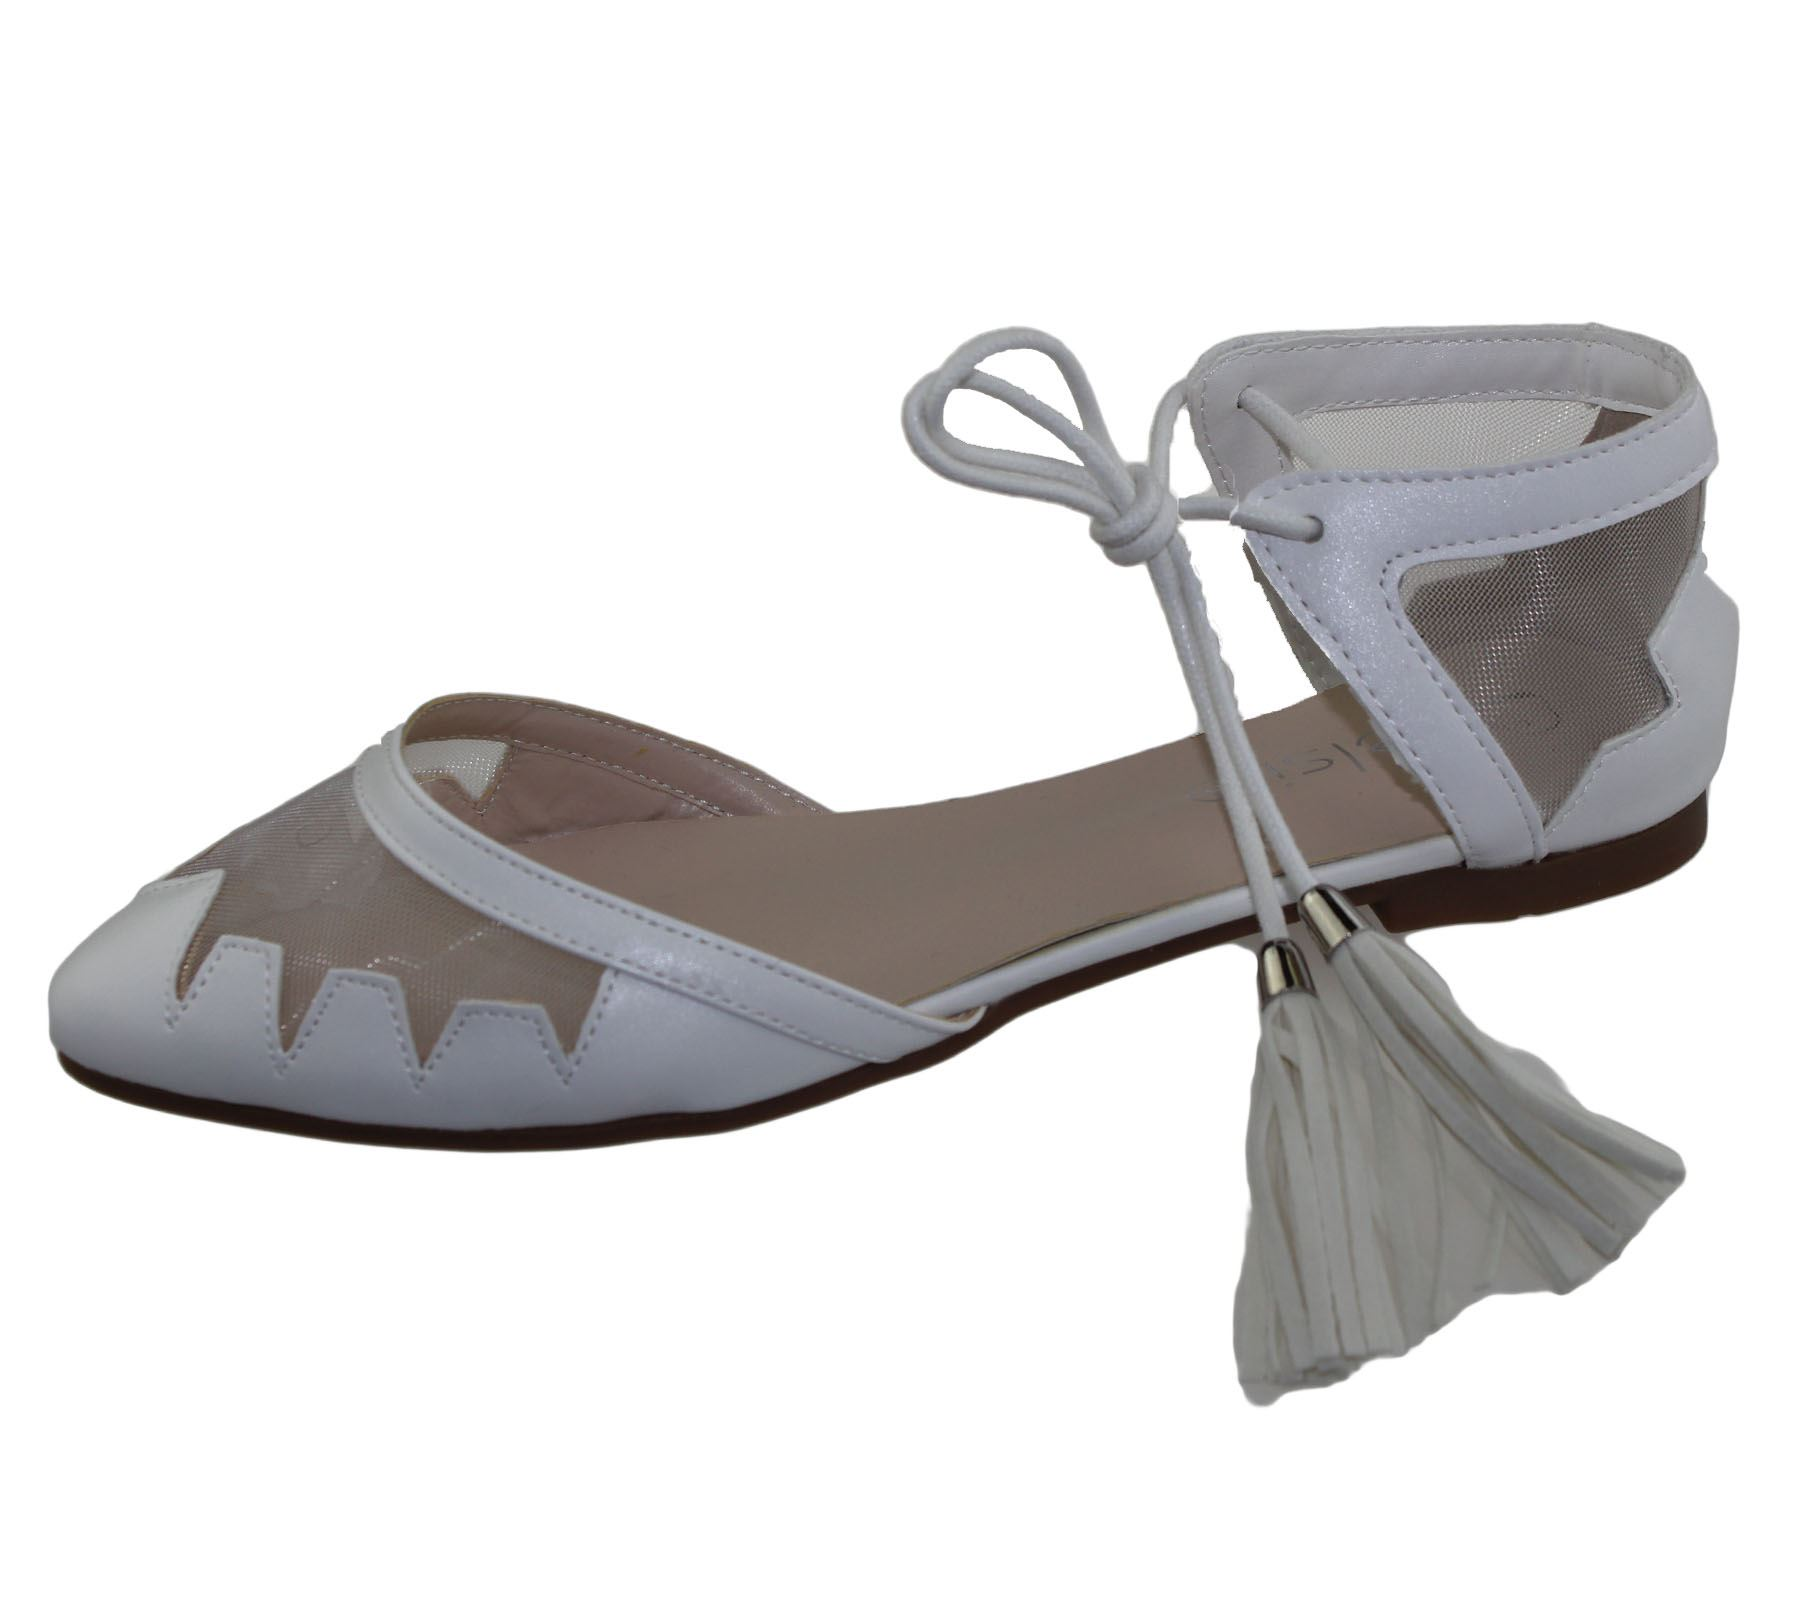 Plates Dolly Escarpins Chaussures Femme Femmes Filles PATENT Ballerina Ballet Chaussures Maille slipons